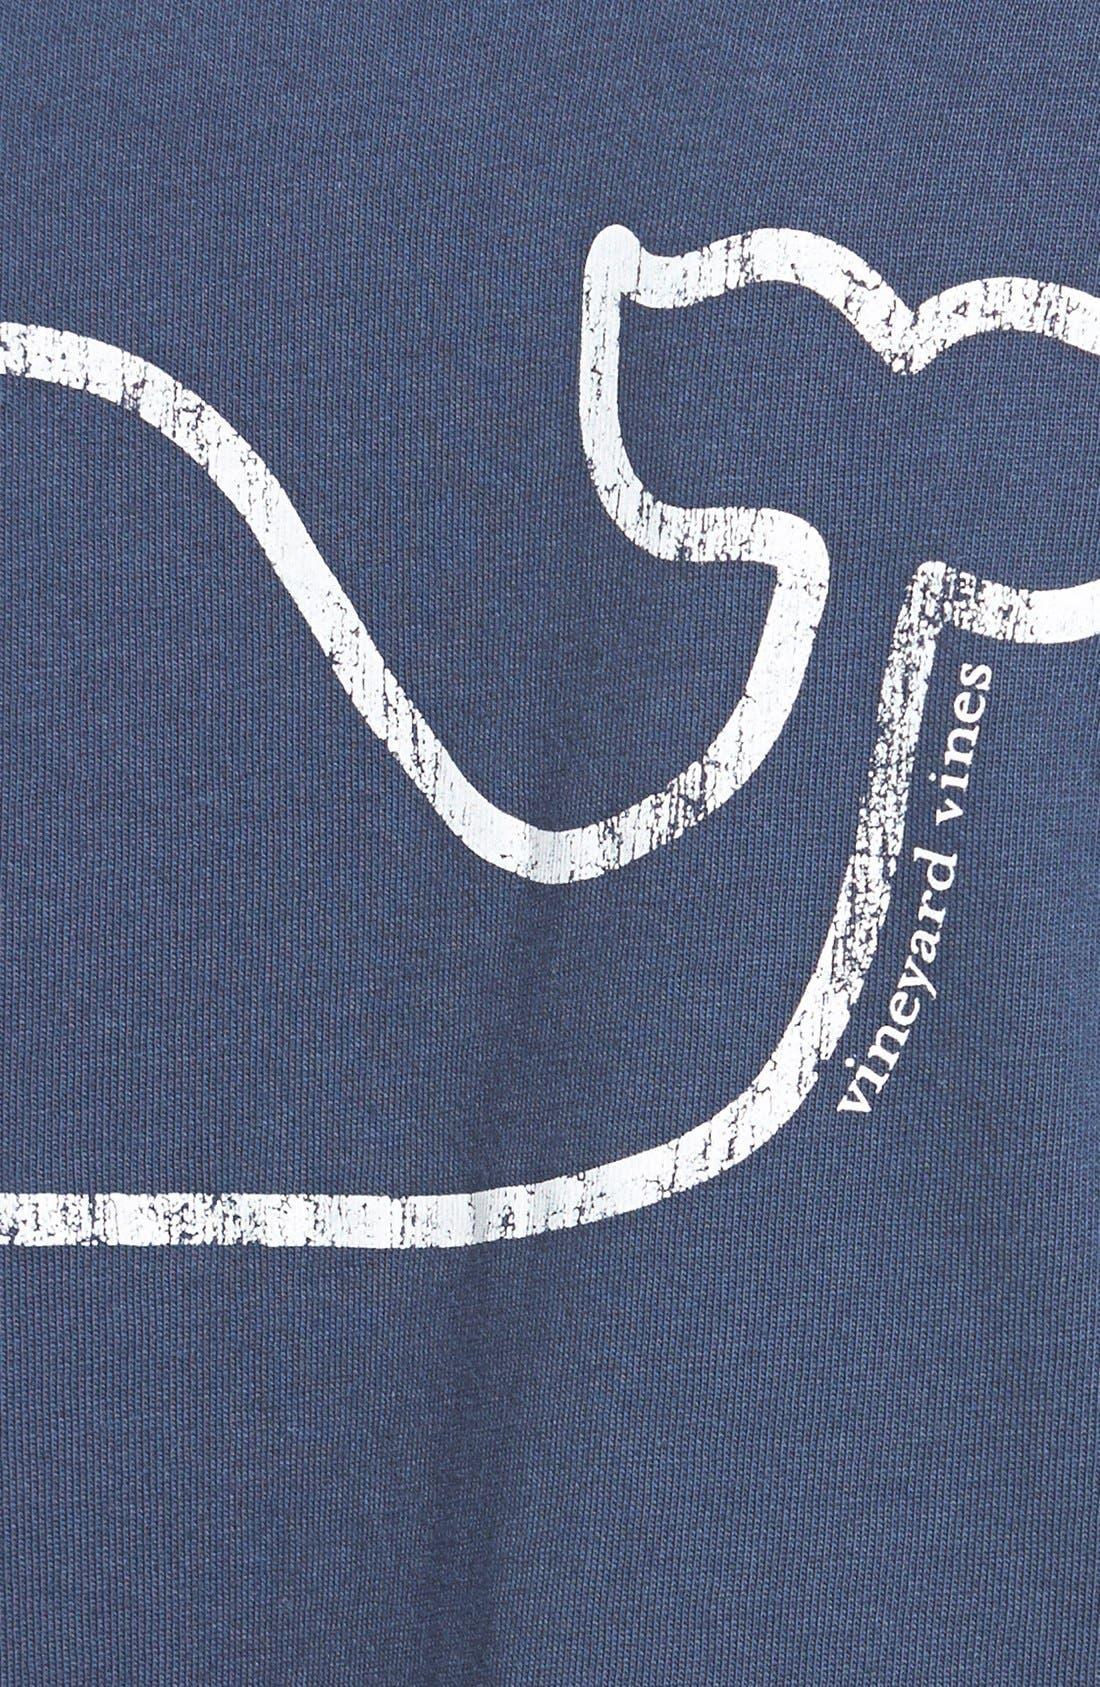 Whale Print Long Sleeve Tee,                             Alternate thumbnail 9, color,                             406